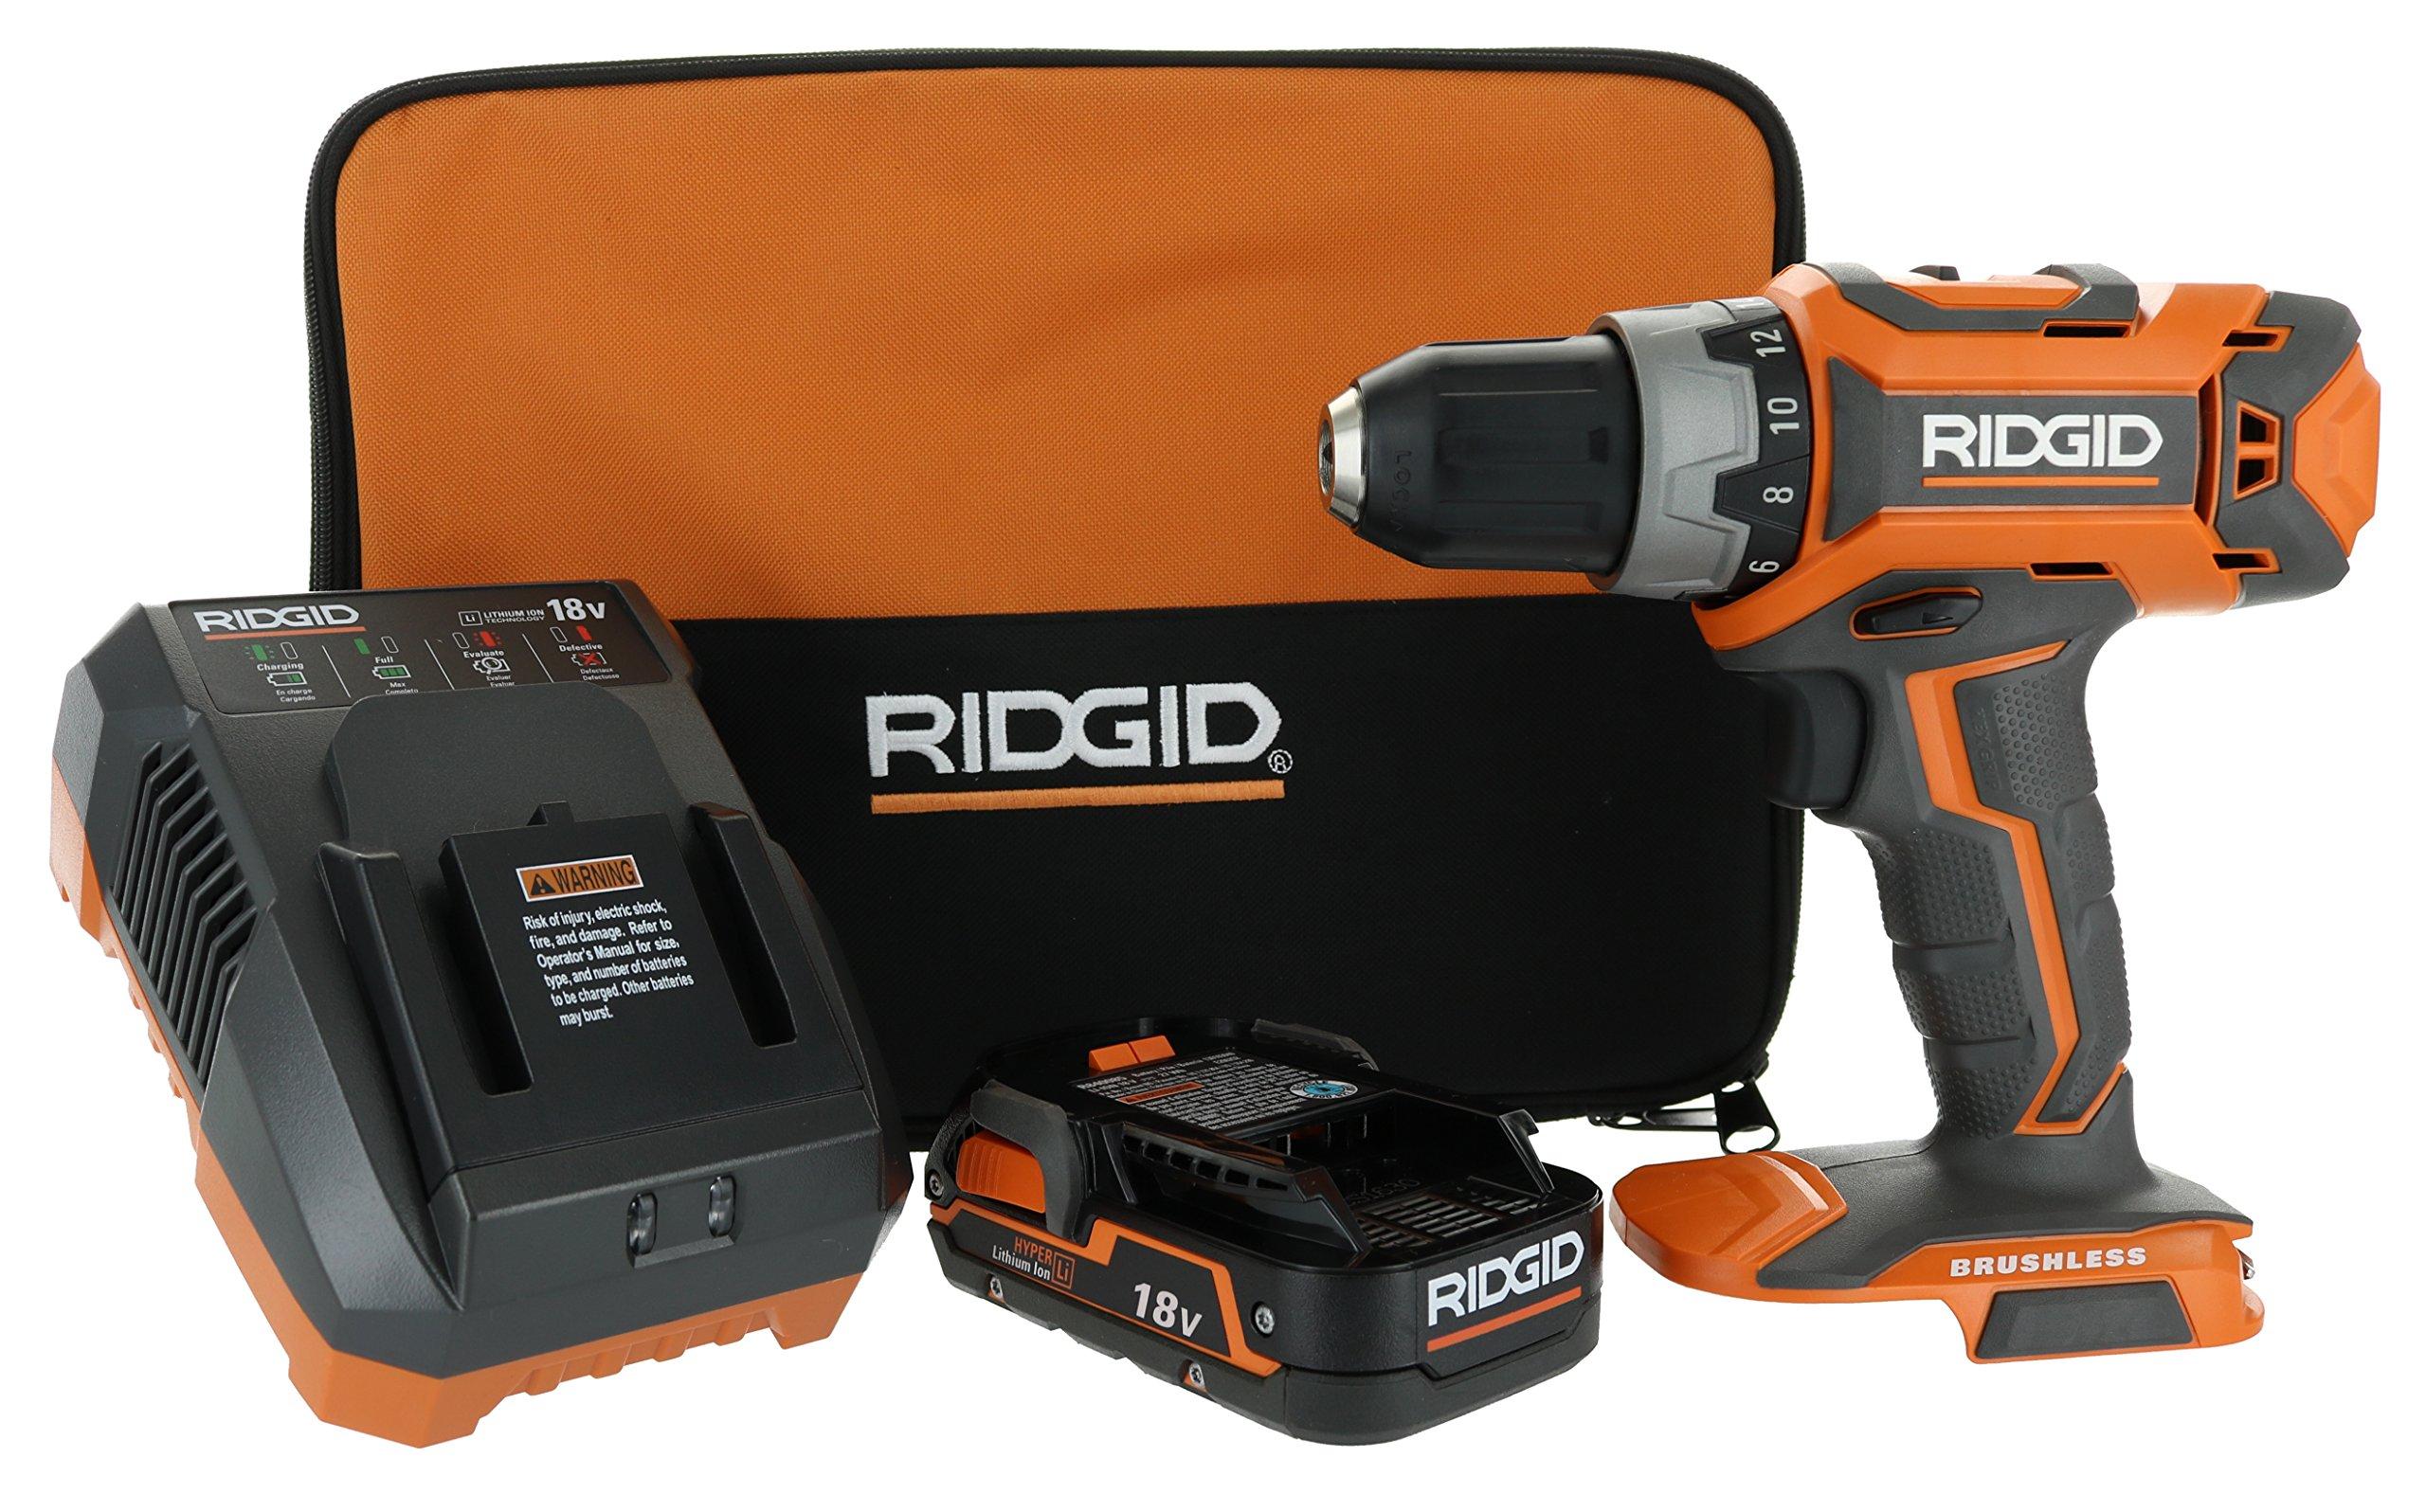 Ridgid  Gen5X 18V Lithium Ion Cordless Brushless 1/2 Inch 2 Speed Drill Driver Combo Kit